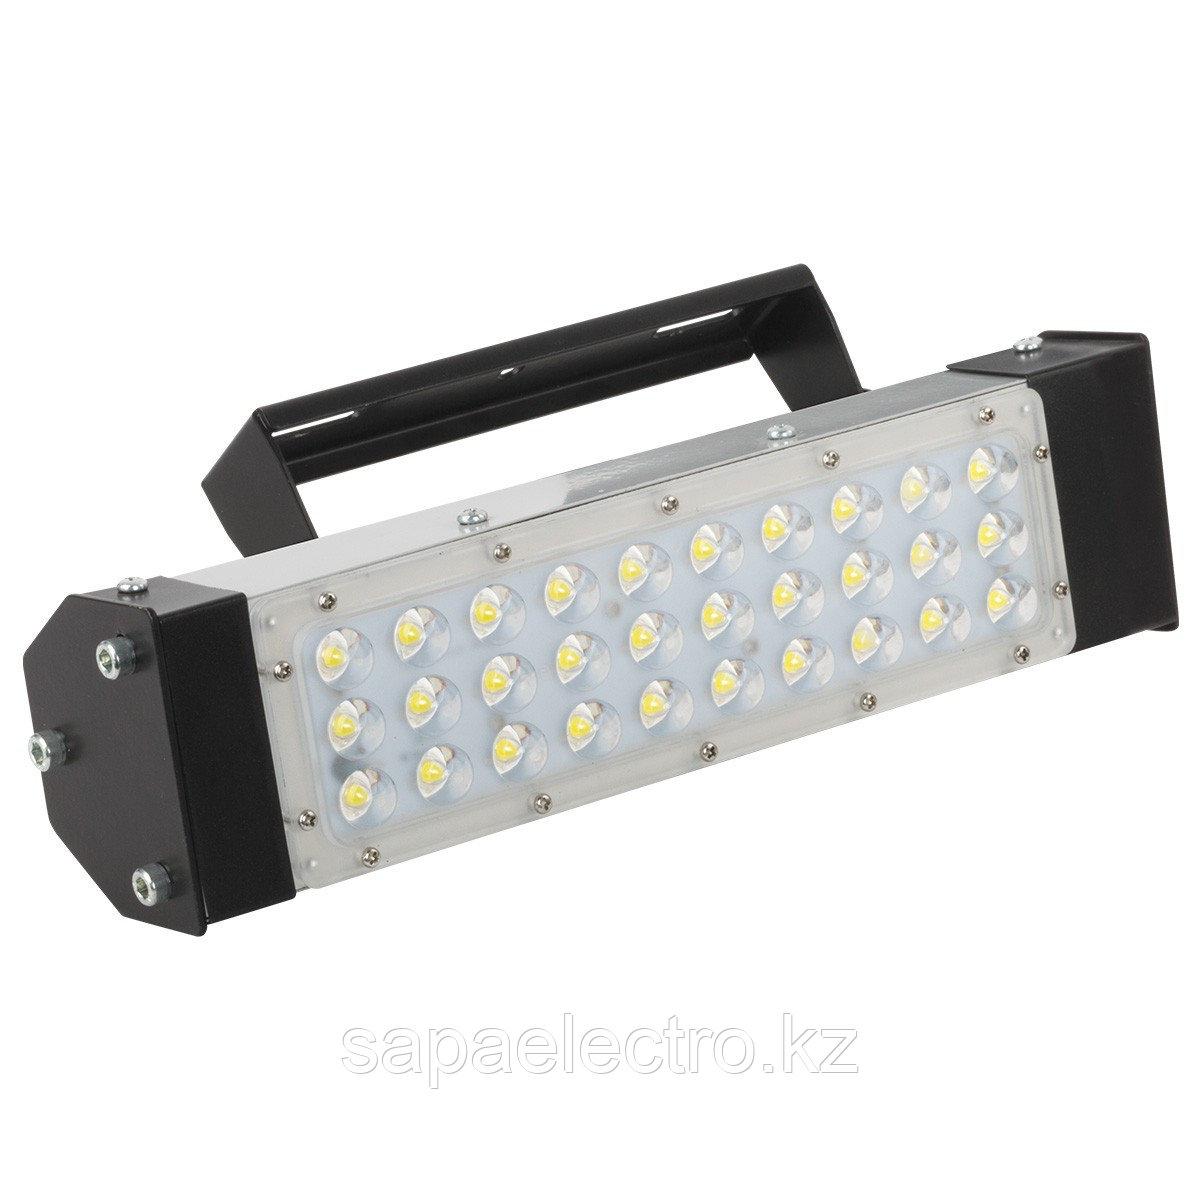 Прожектор LED (Линейный) 30W MEGALUX (TS)